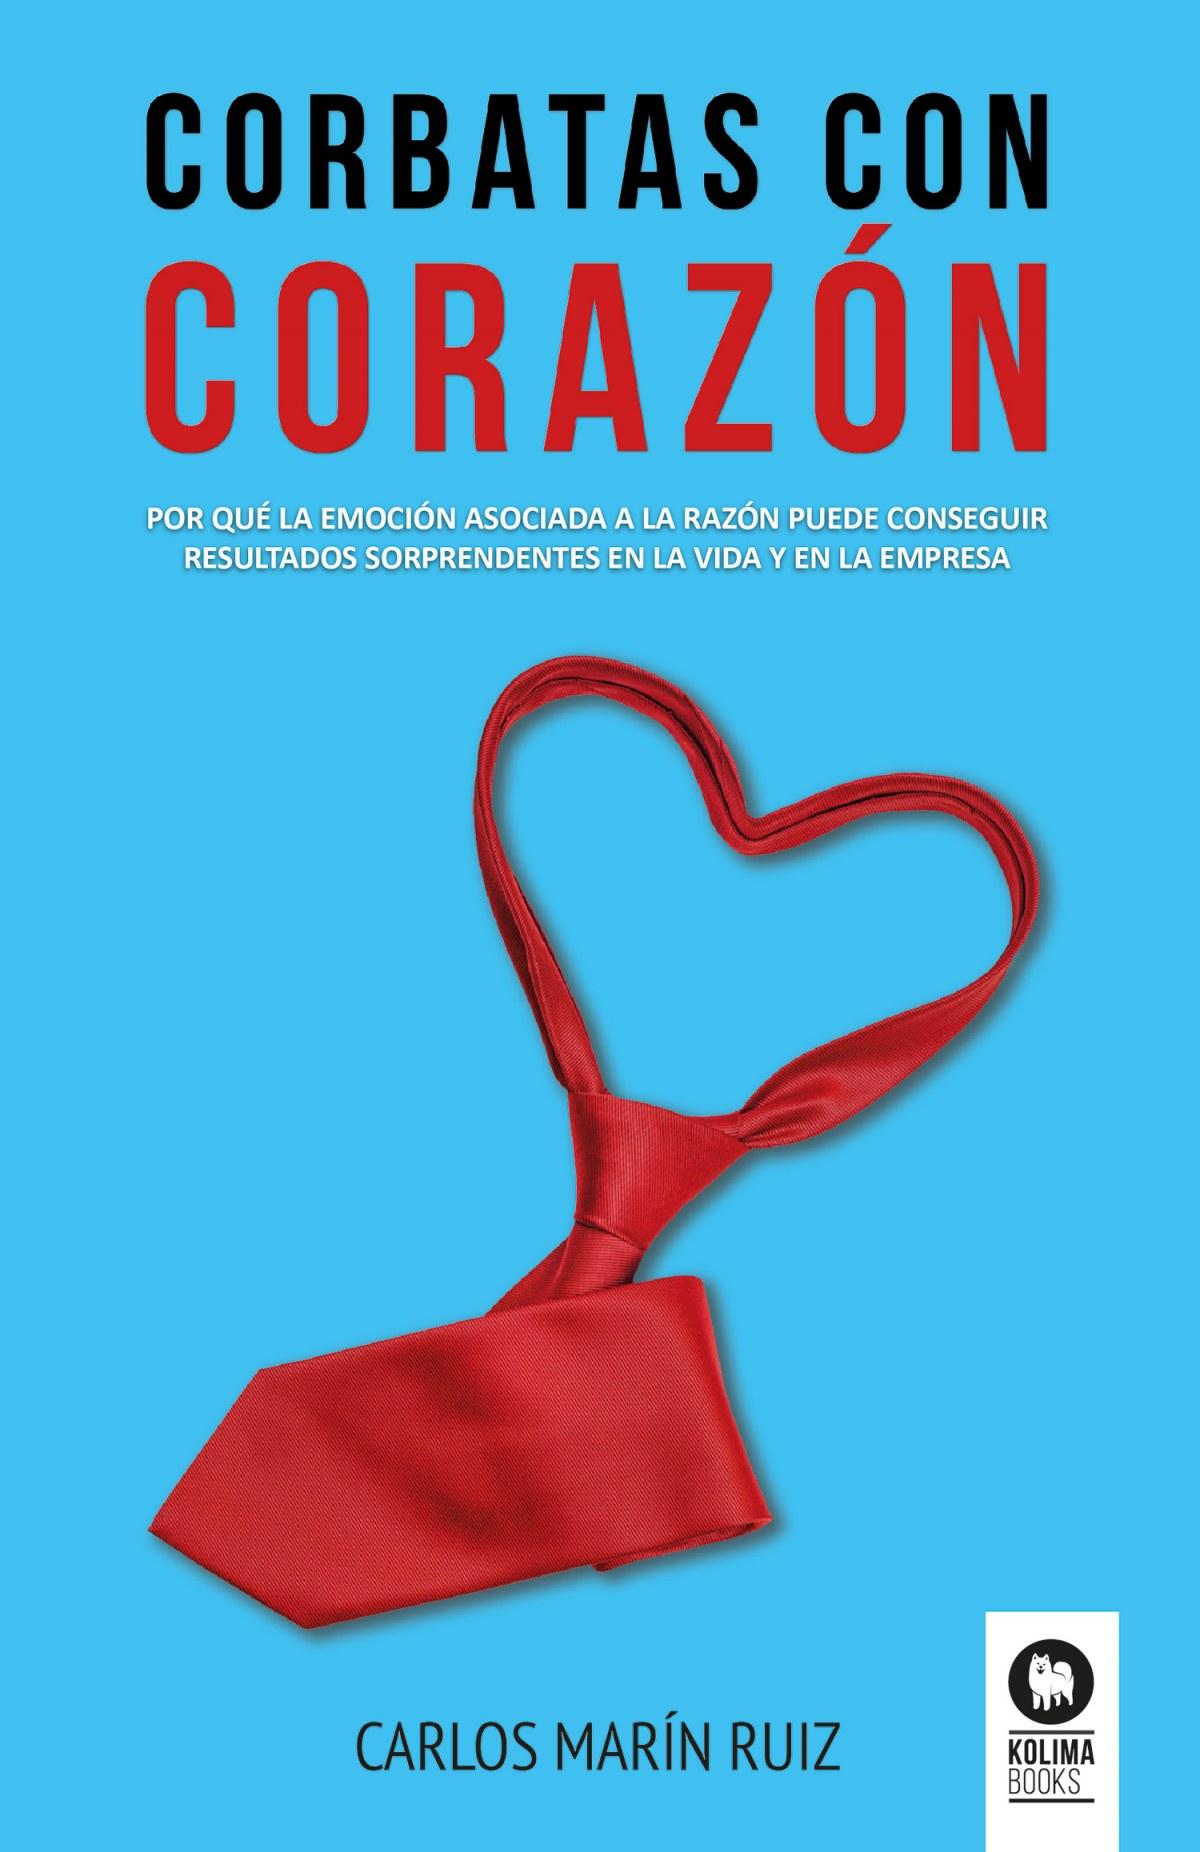 CORBATAS CON CORAZÓN